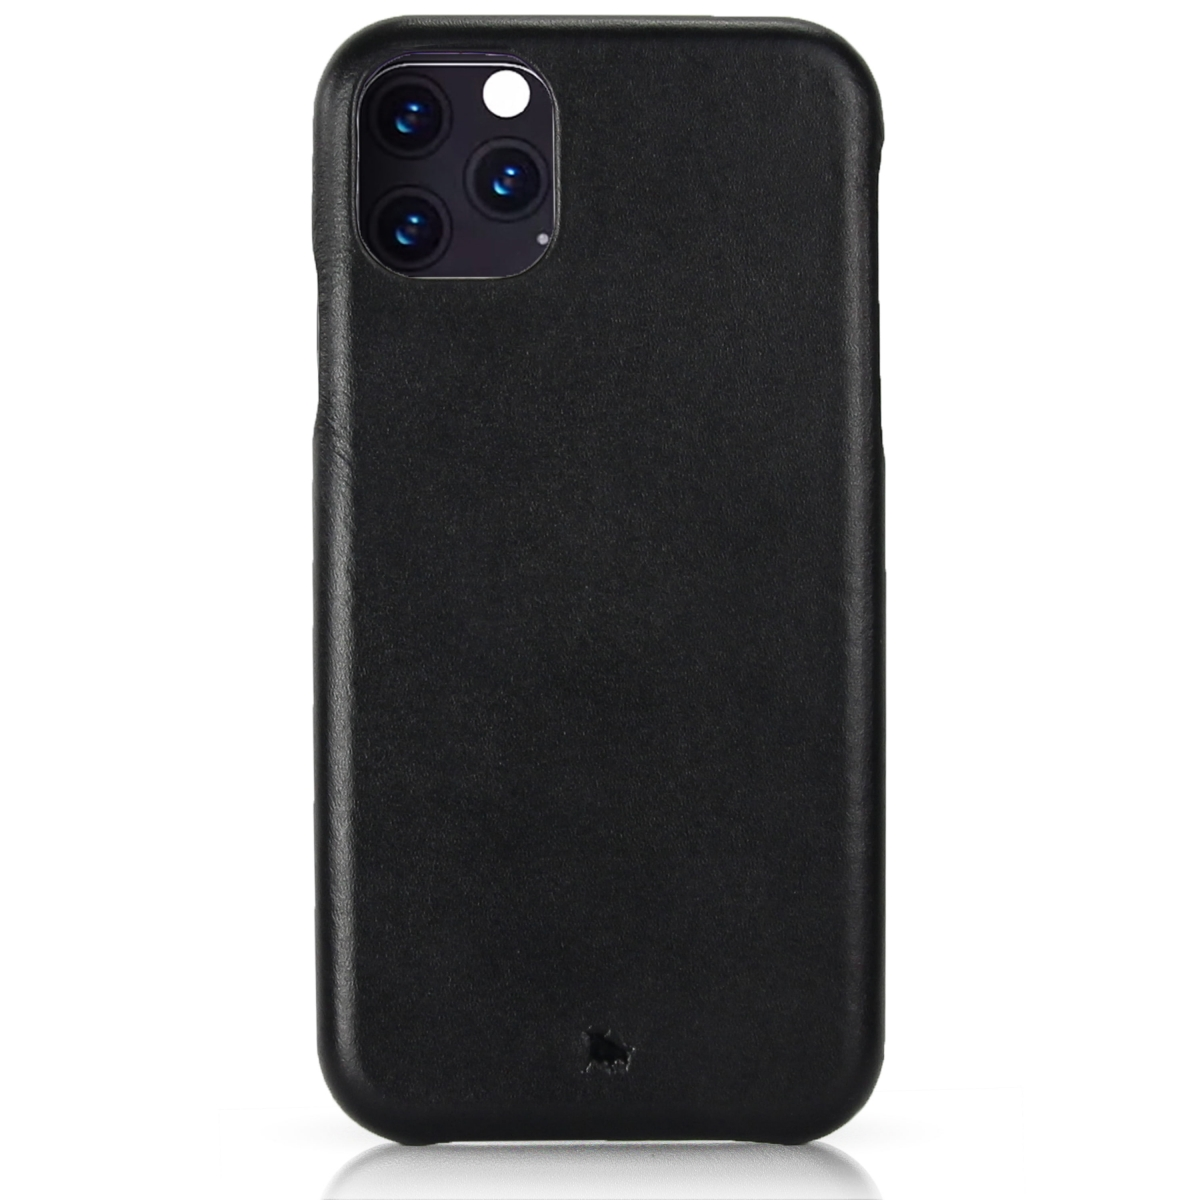 iPhone 11 XI Pro Max Leder Hülle  - slim Design